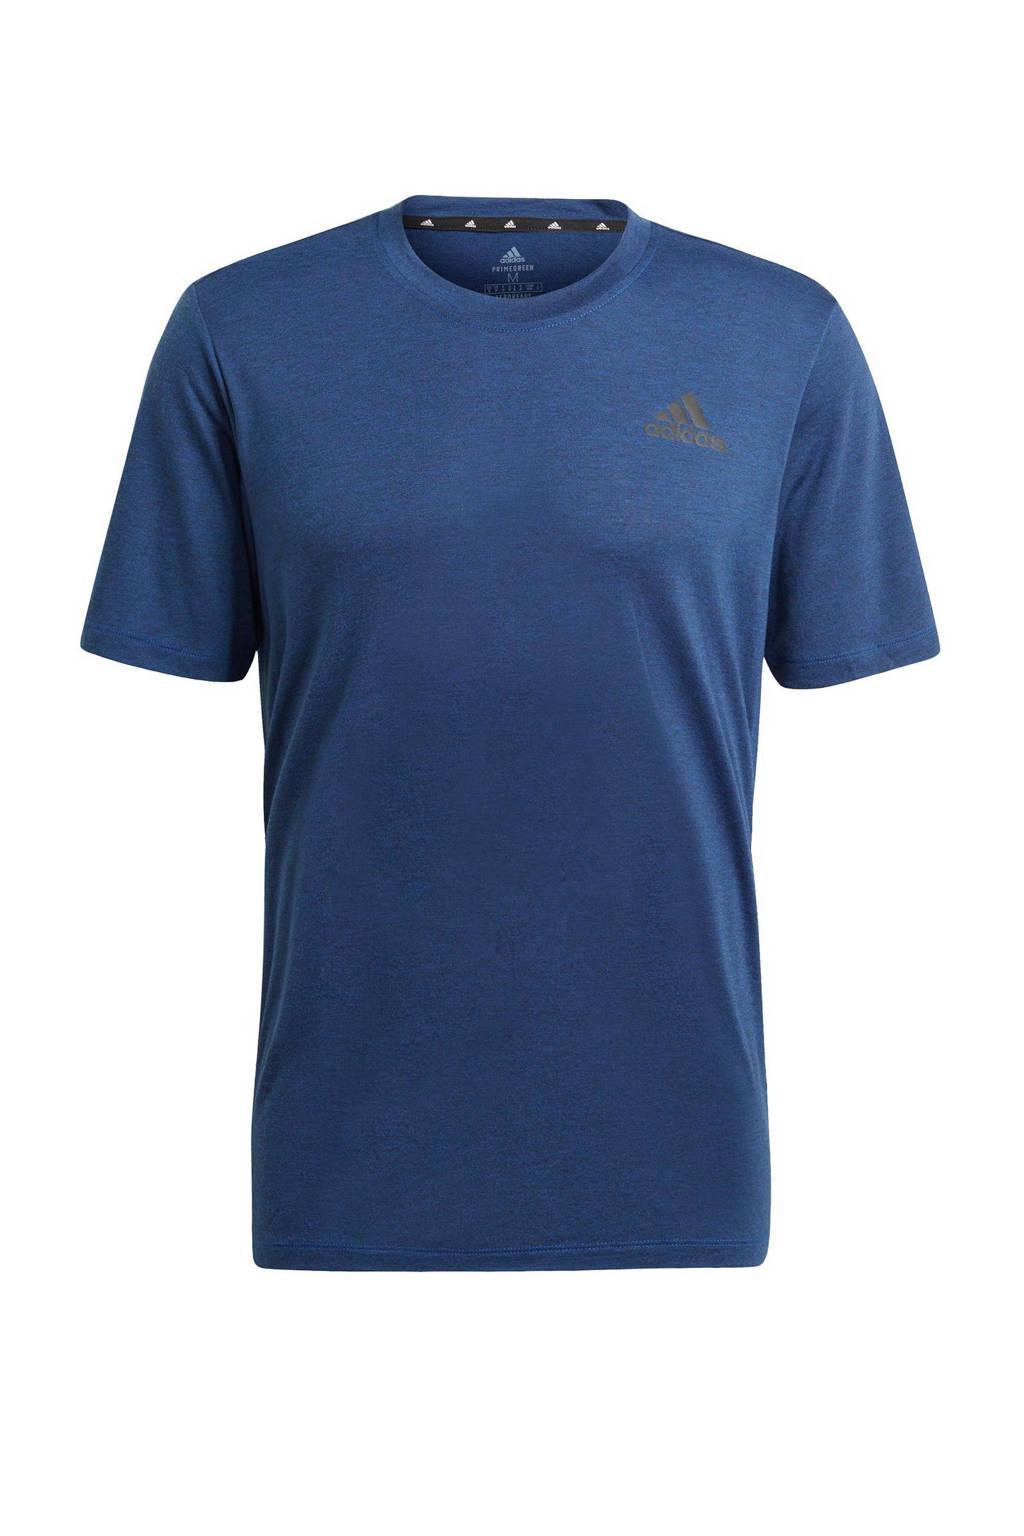 adidas Performance   sport T-shirt blauw/zwart, Blauw/zwart